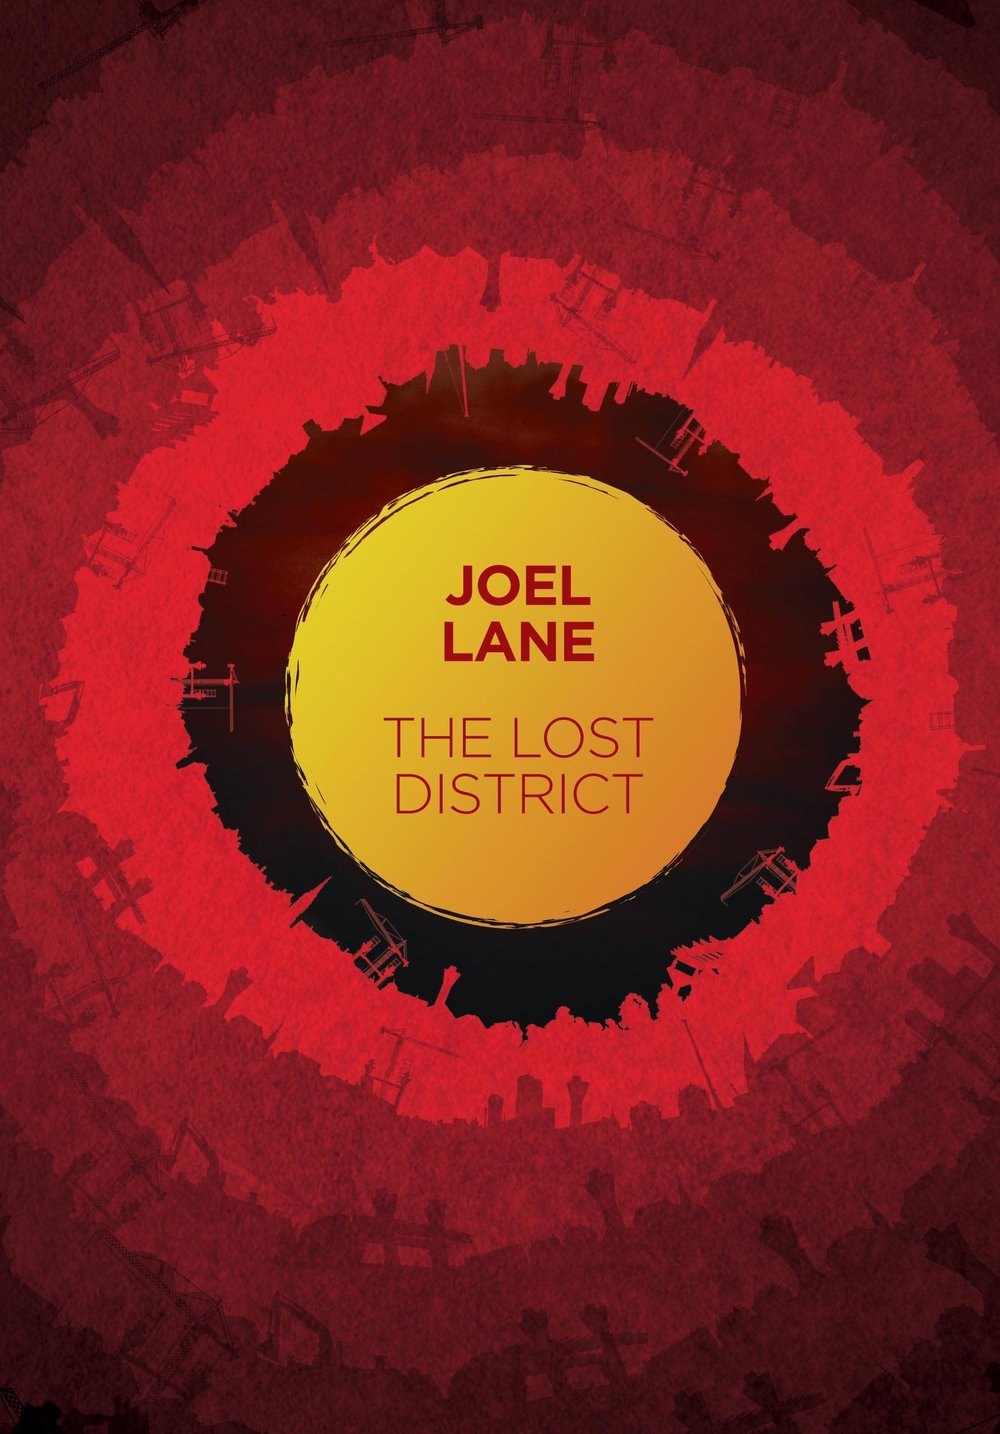 Lost District MOck.jpg